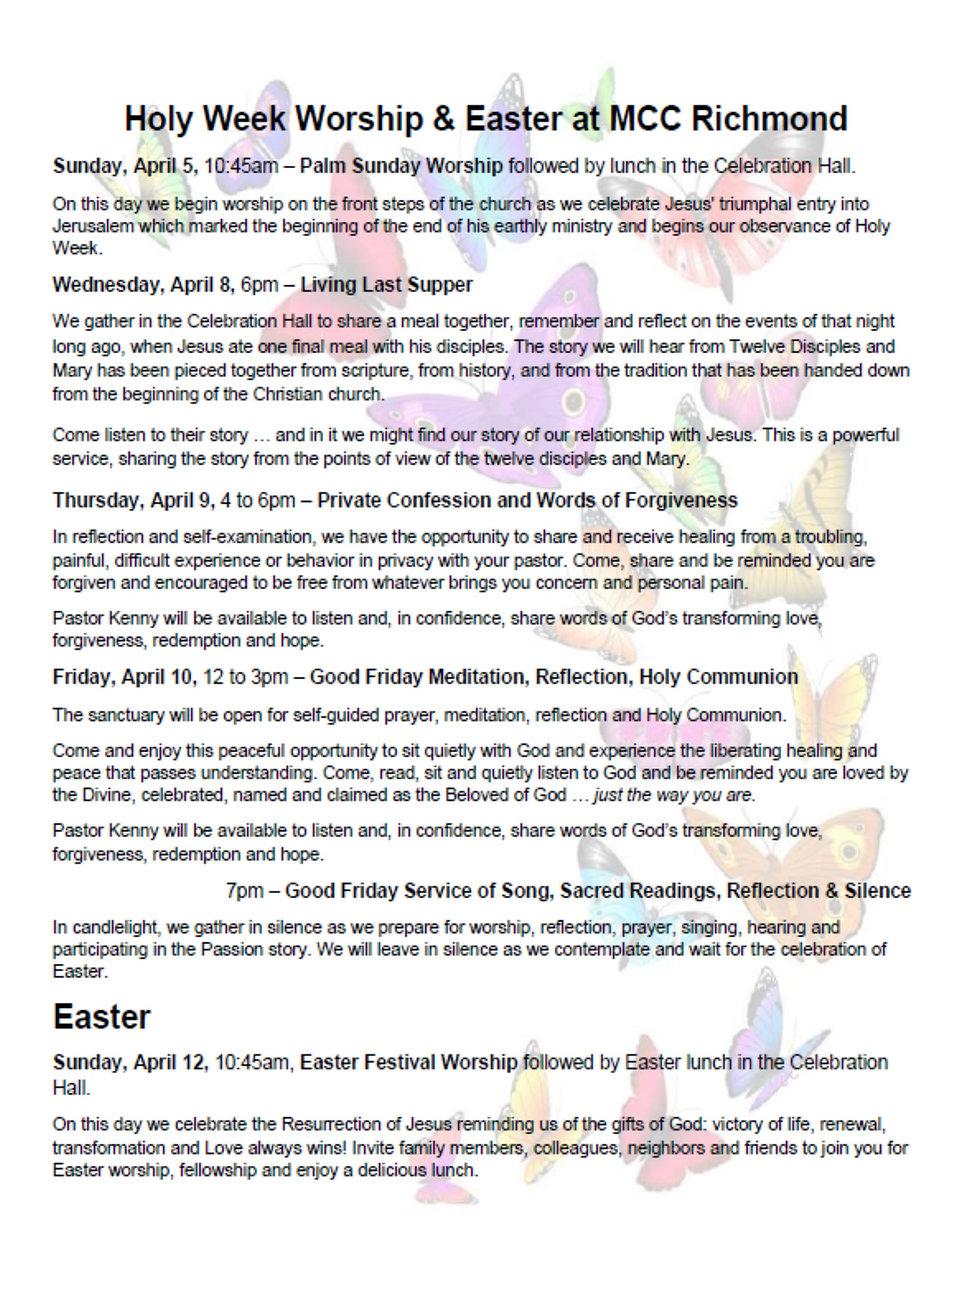 Holy Week Easter 2020 Flyer.jpg